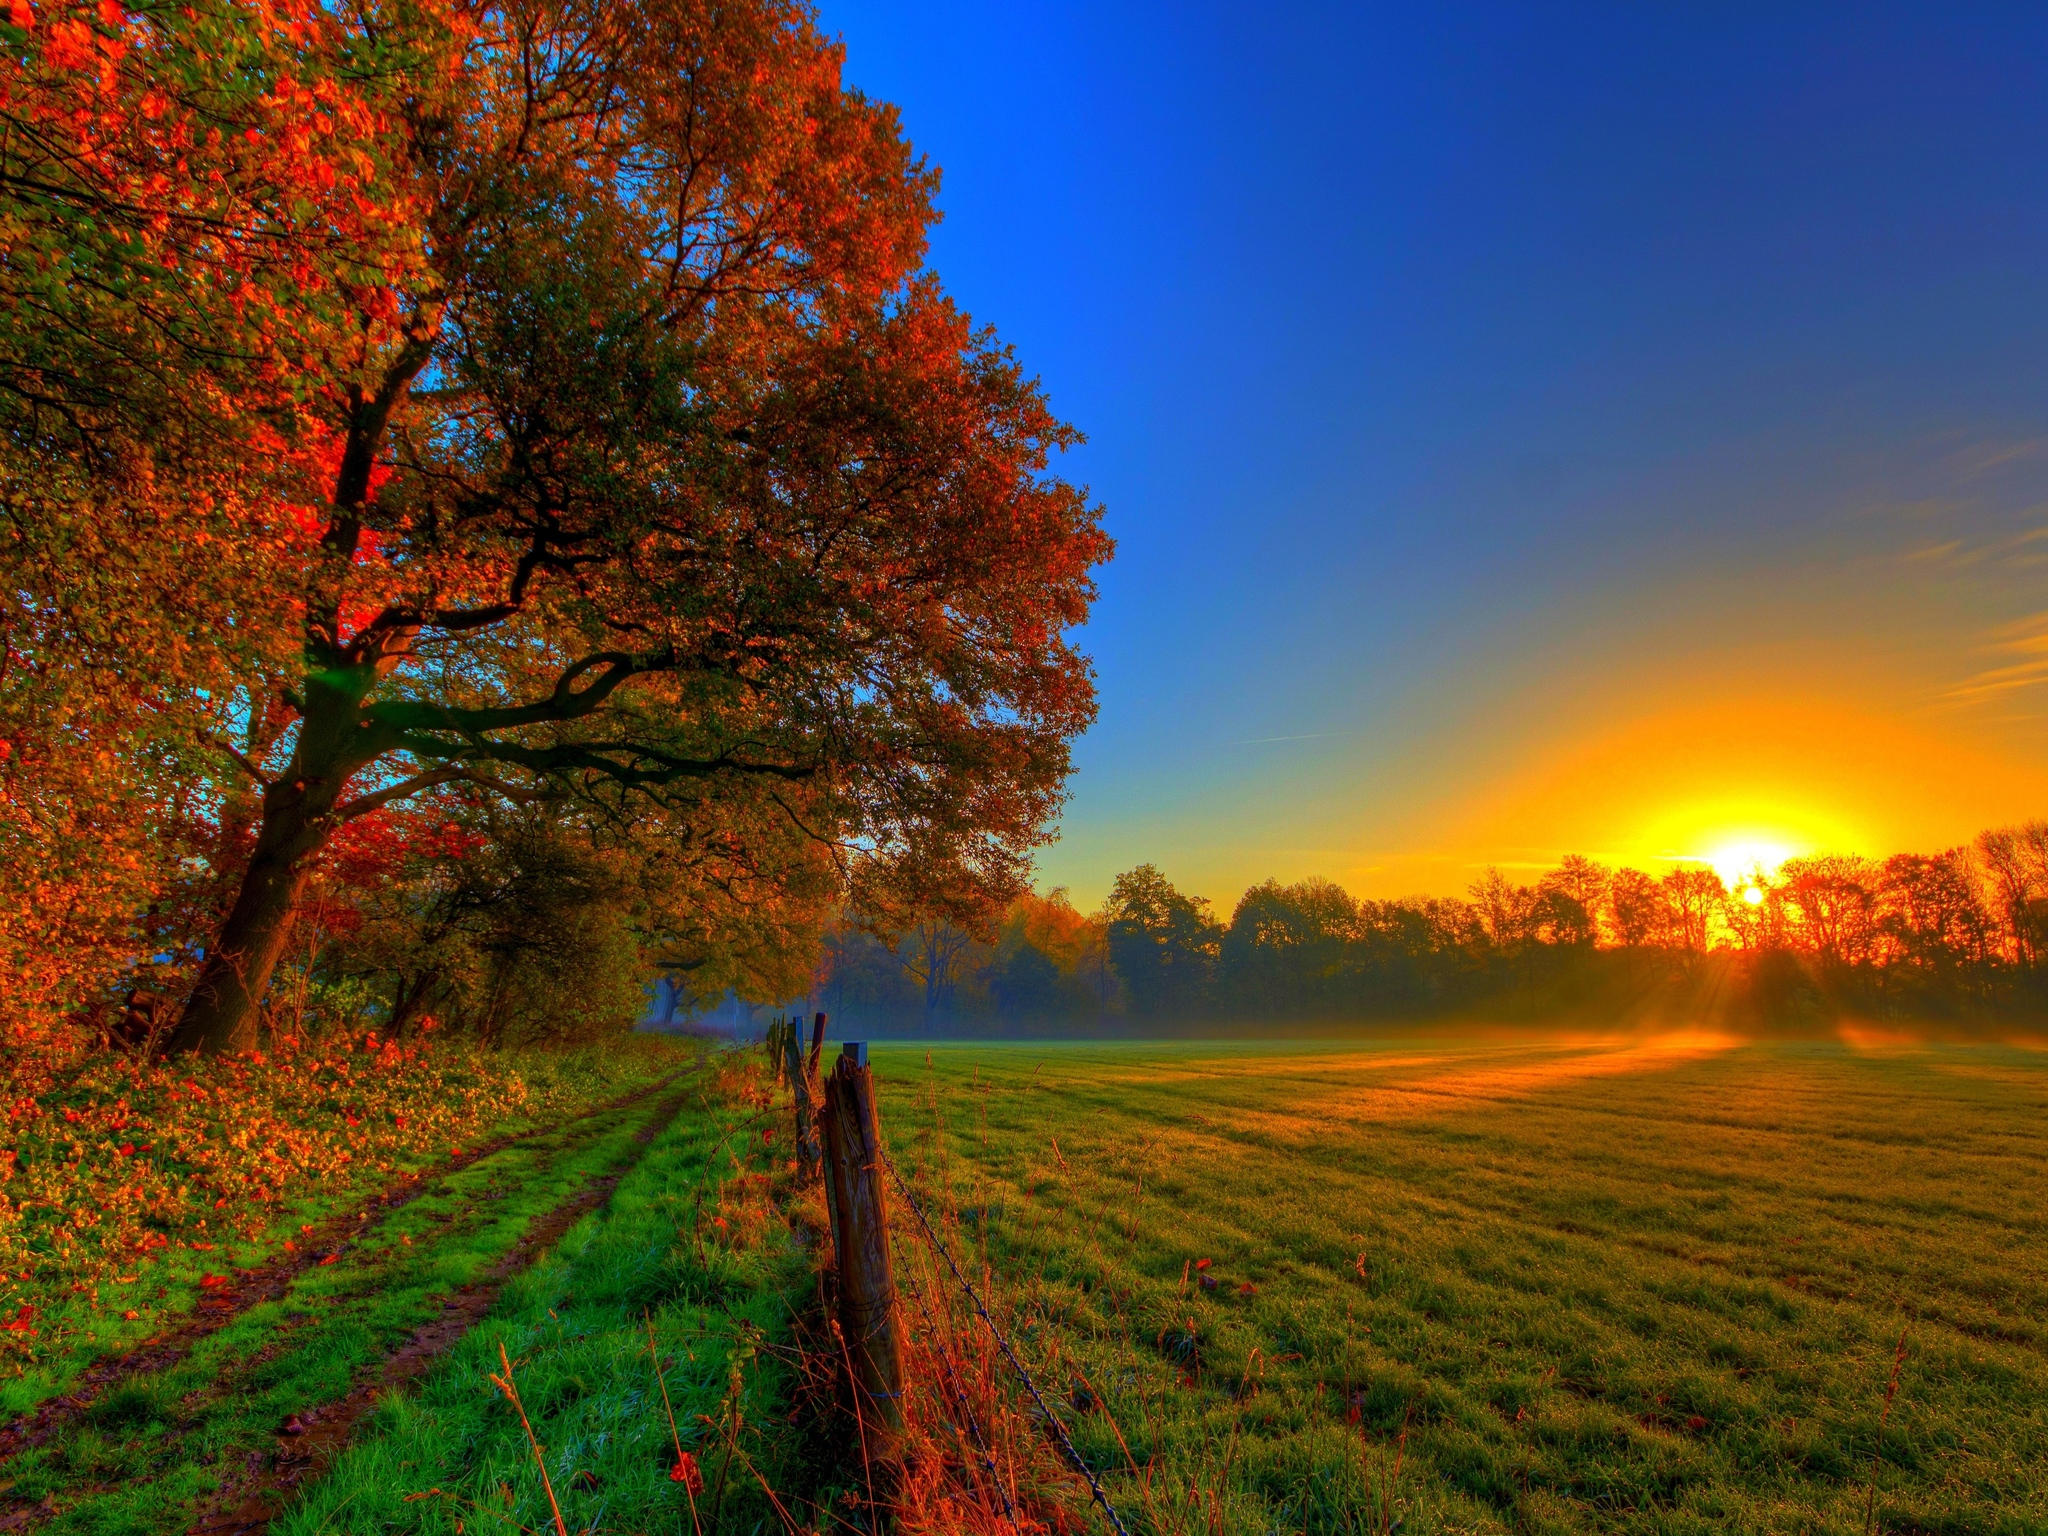 Amazing Ipad Wallpaper 4K Nature Pictures